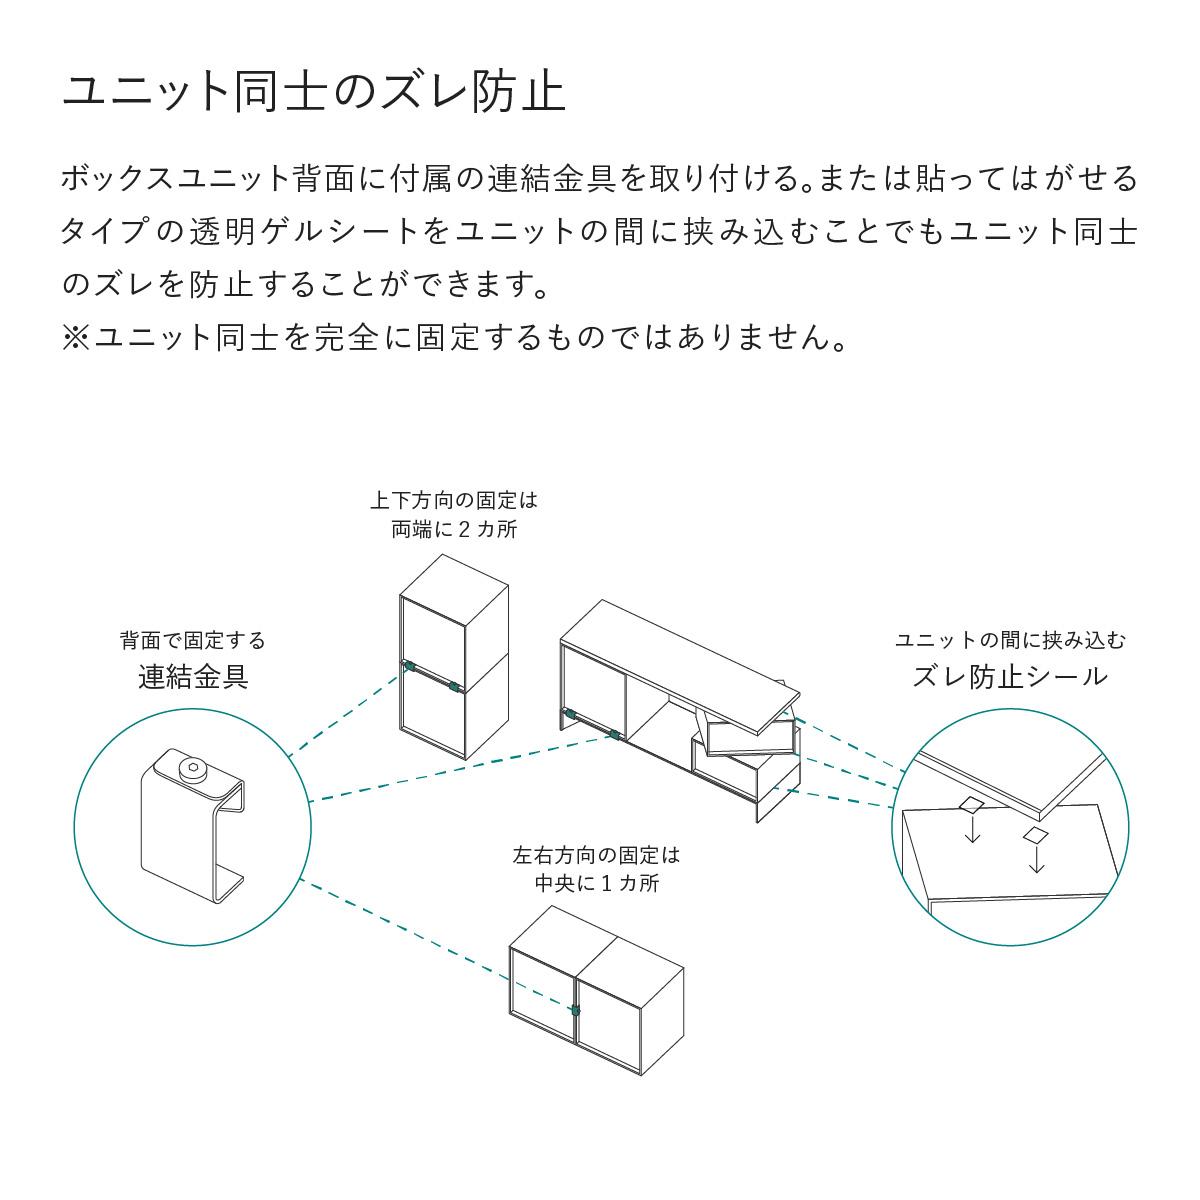 【V-TISS LIGHT】 ハーフ浅型 (横取付けタイプ)